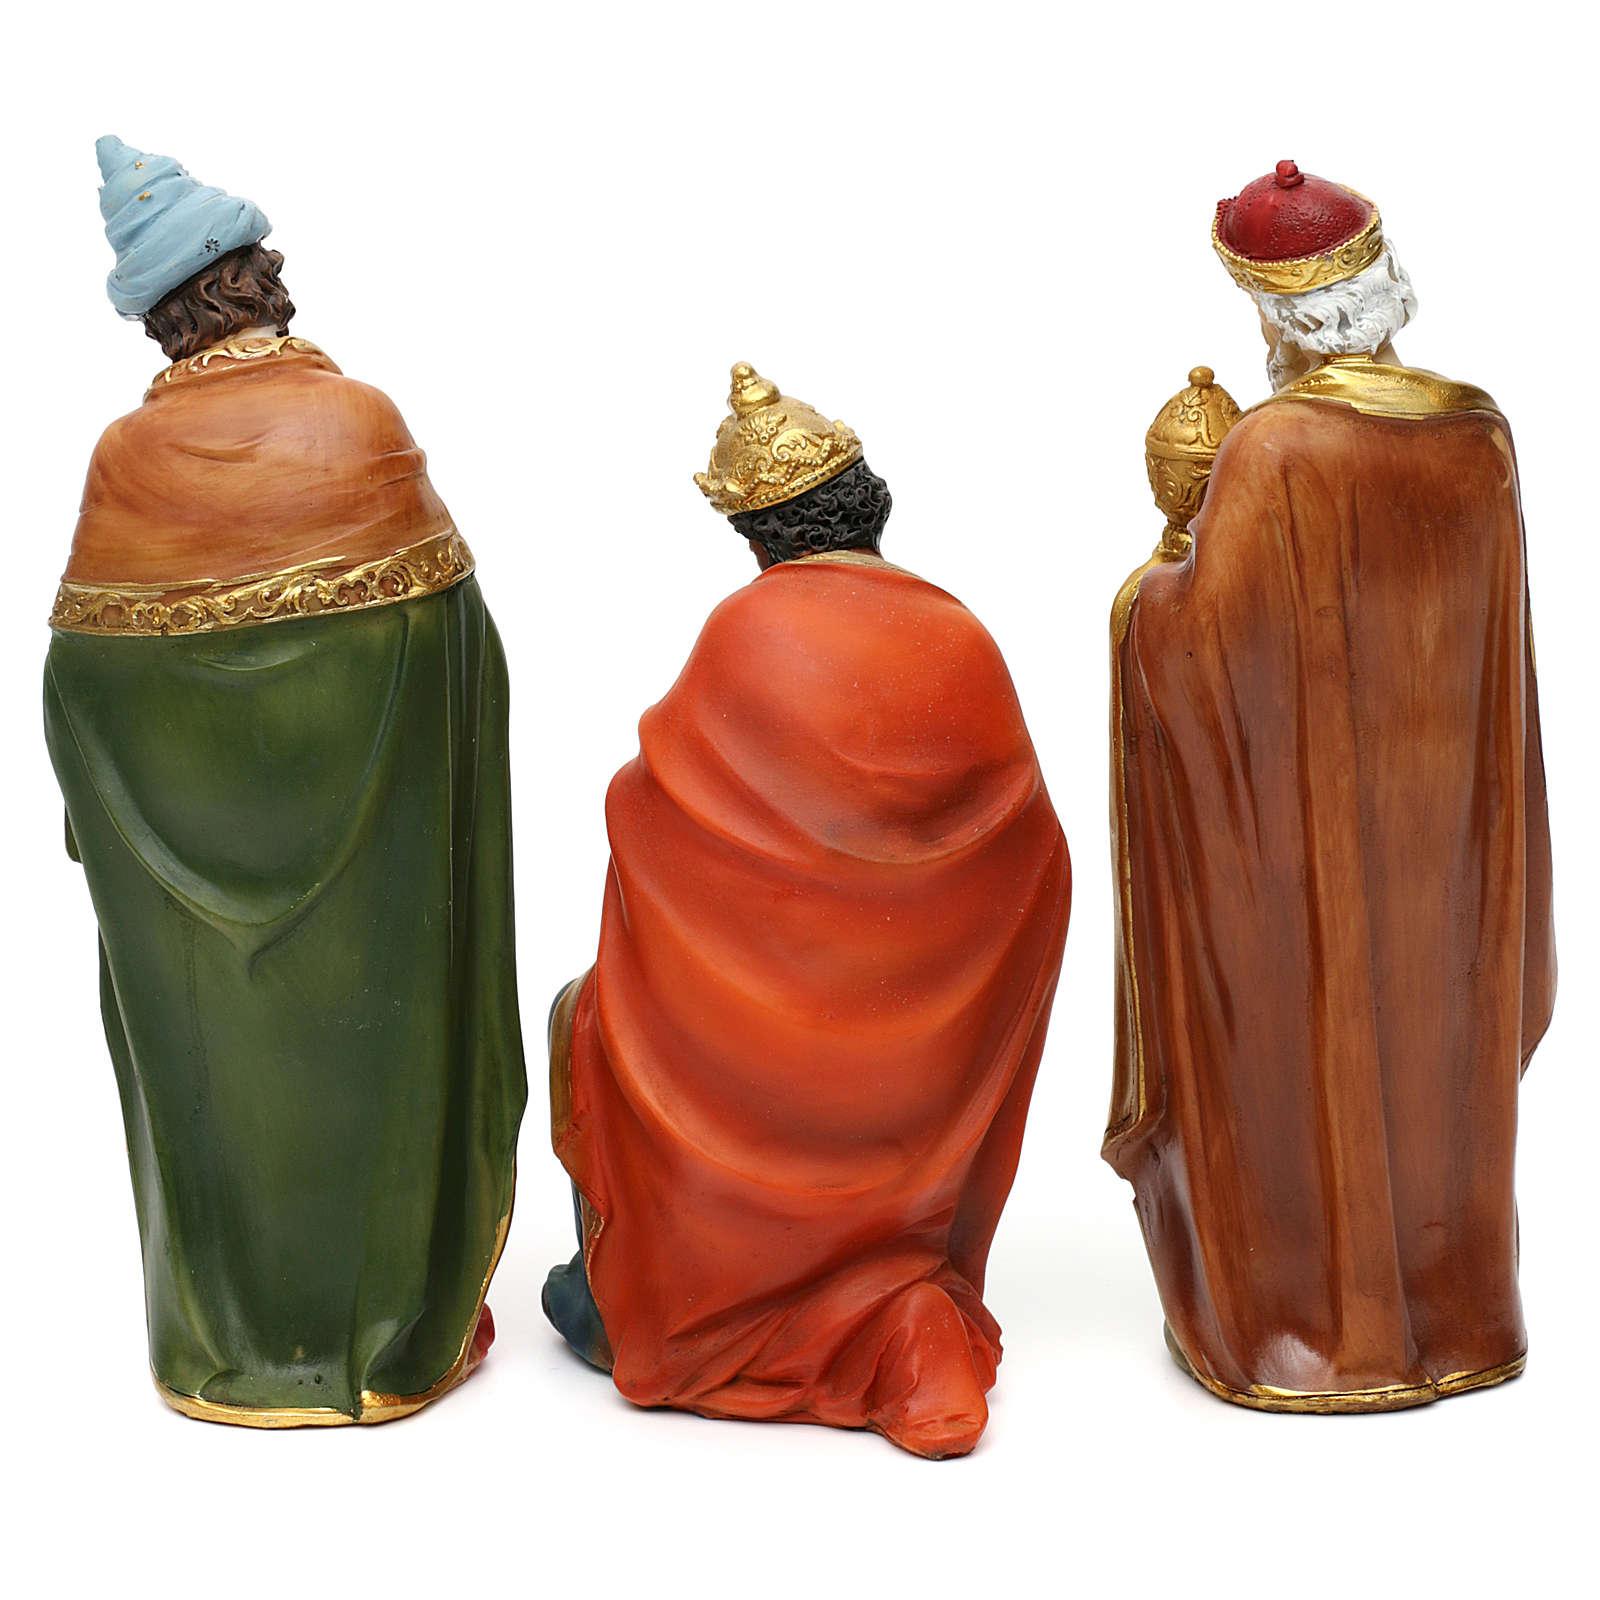 STOCK Belén 20 cm de madera 11 estatuas 4